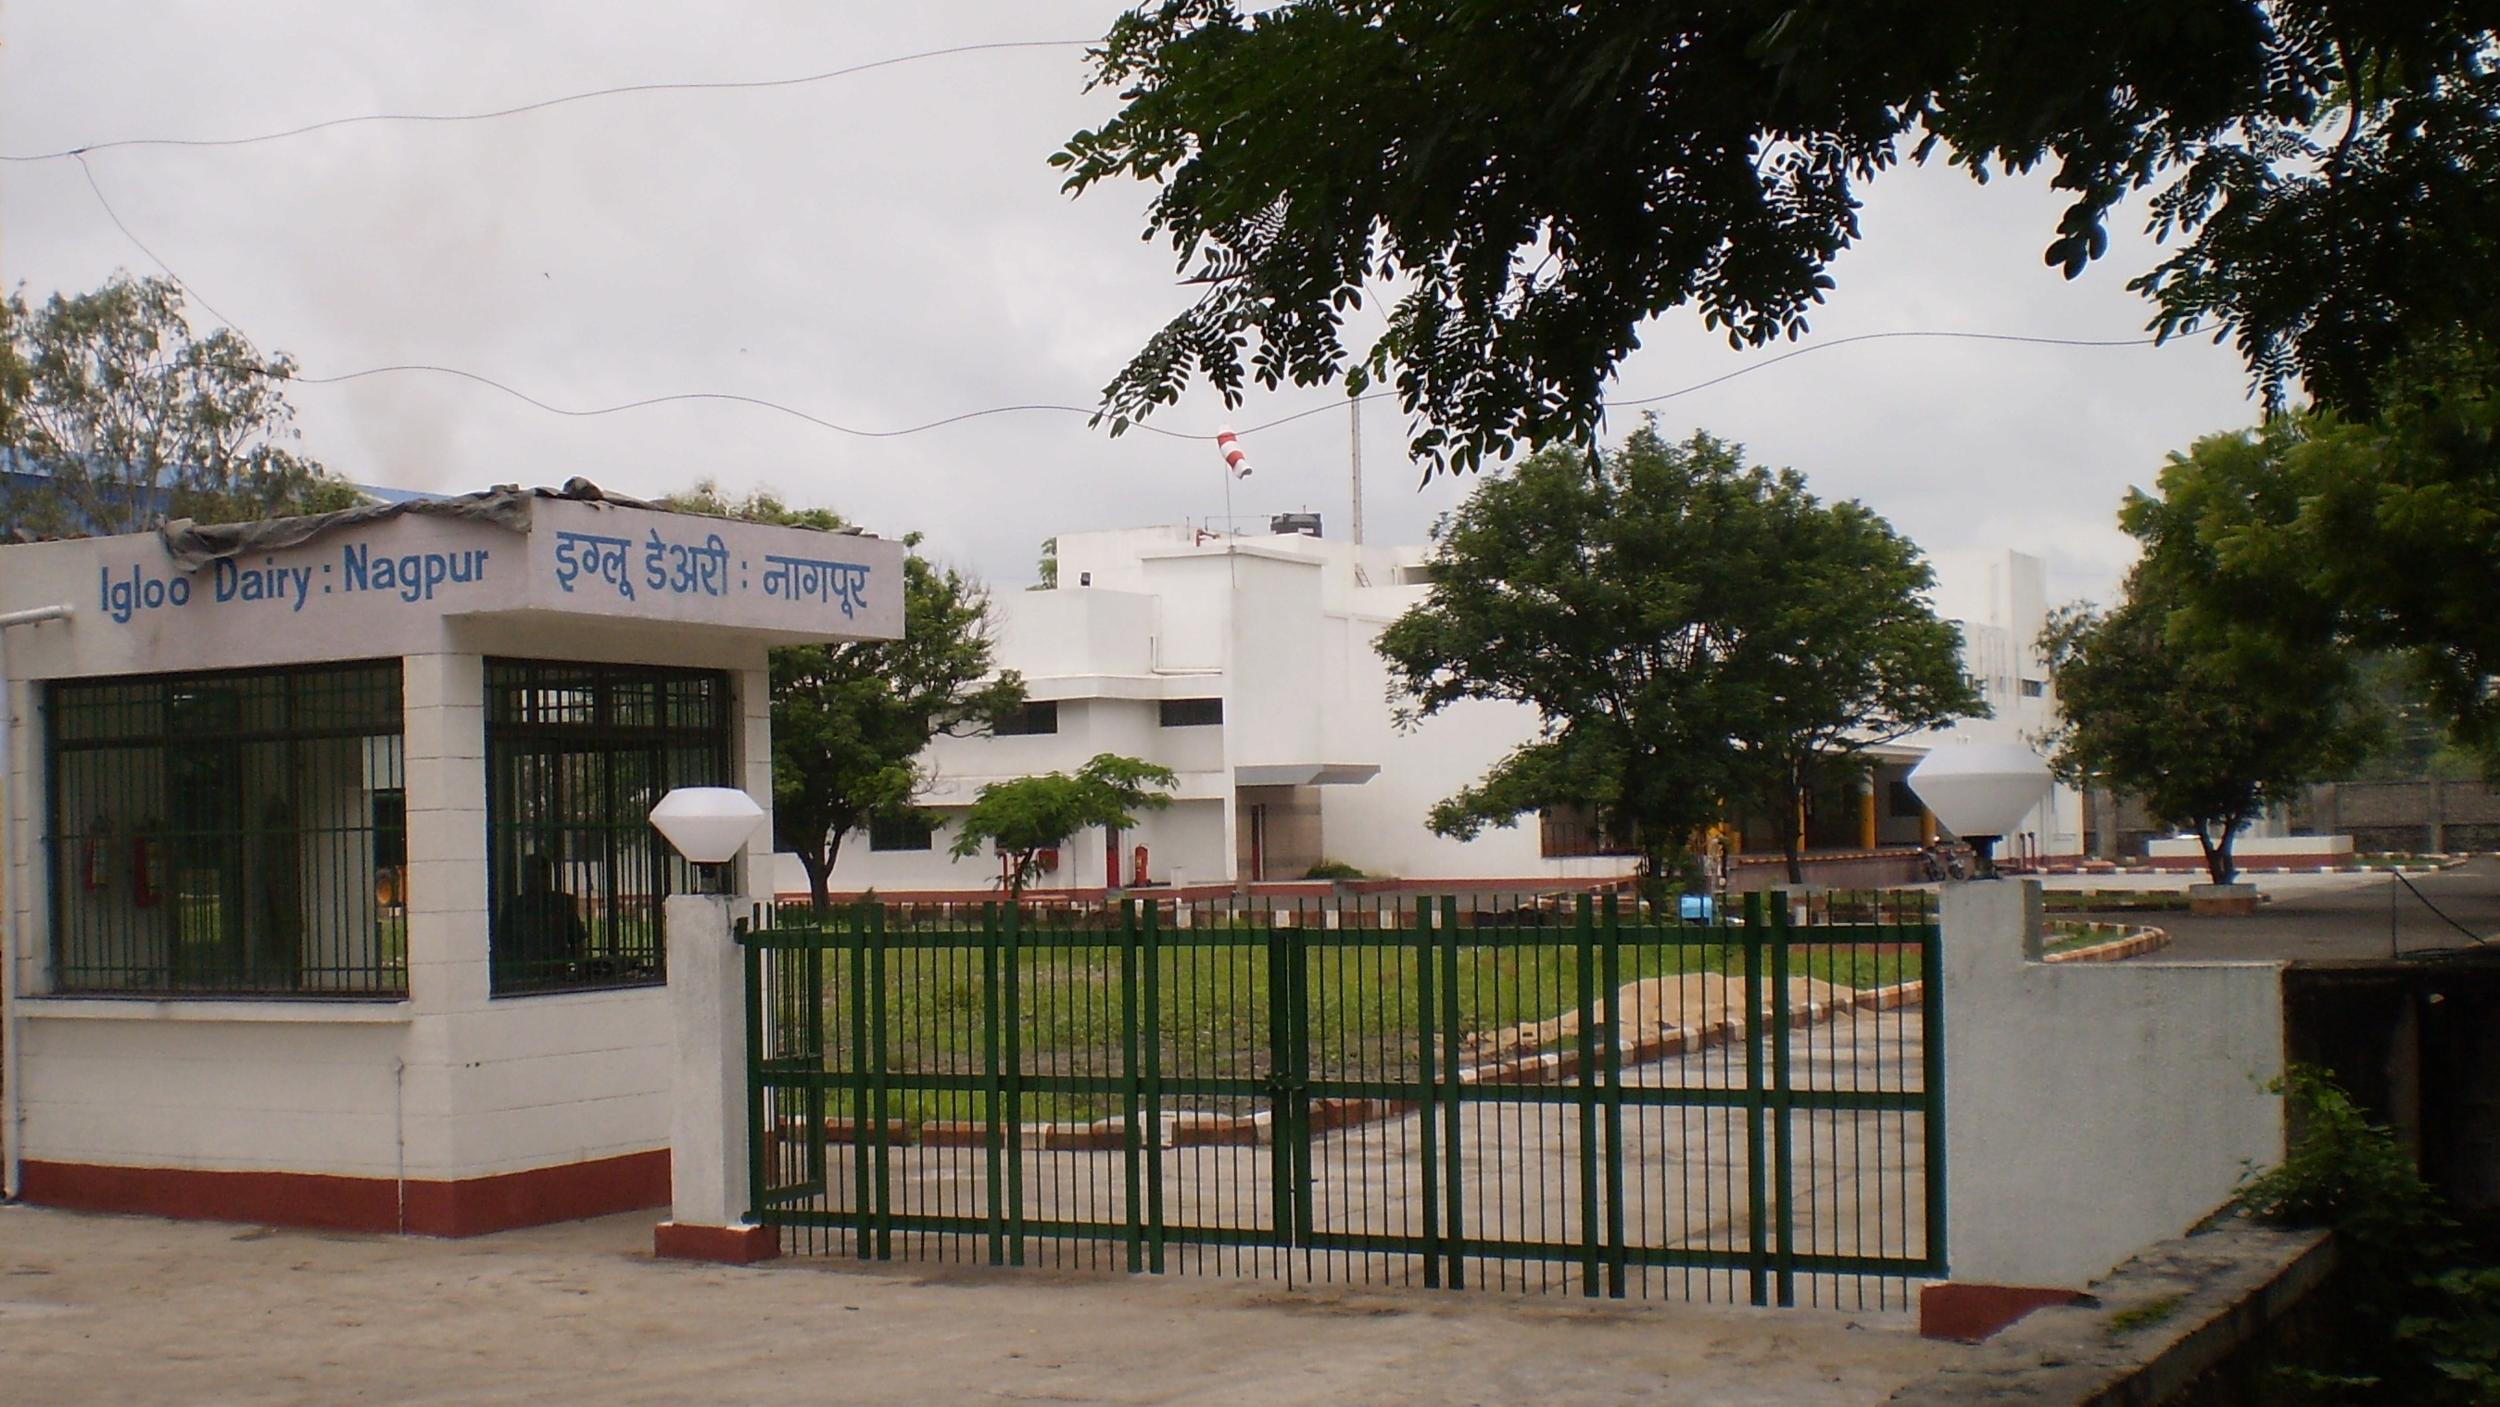 Igloo Dairy : Nagpur